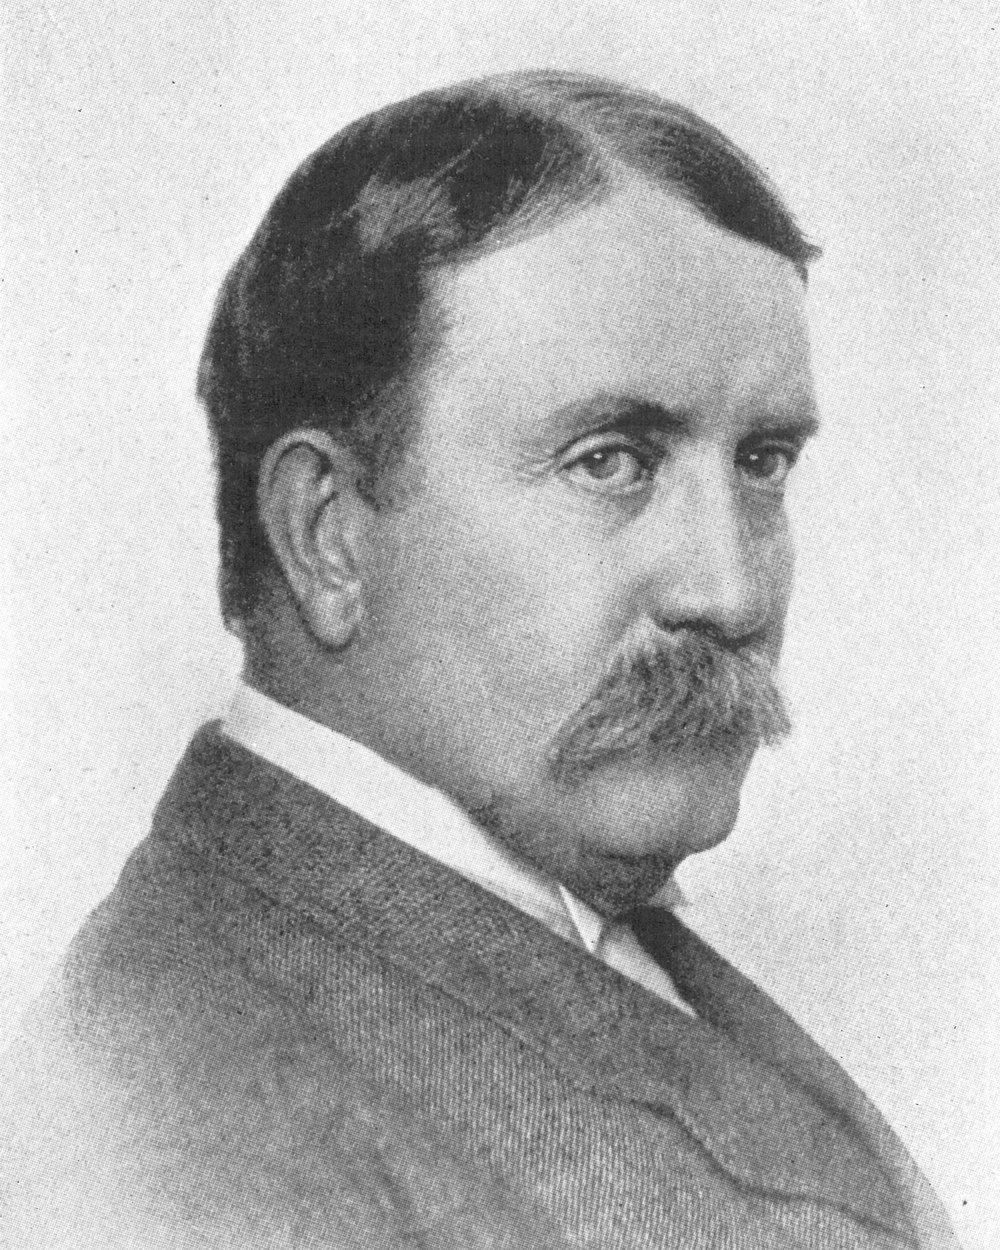 daniel-burnham-1912.jpg